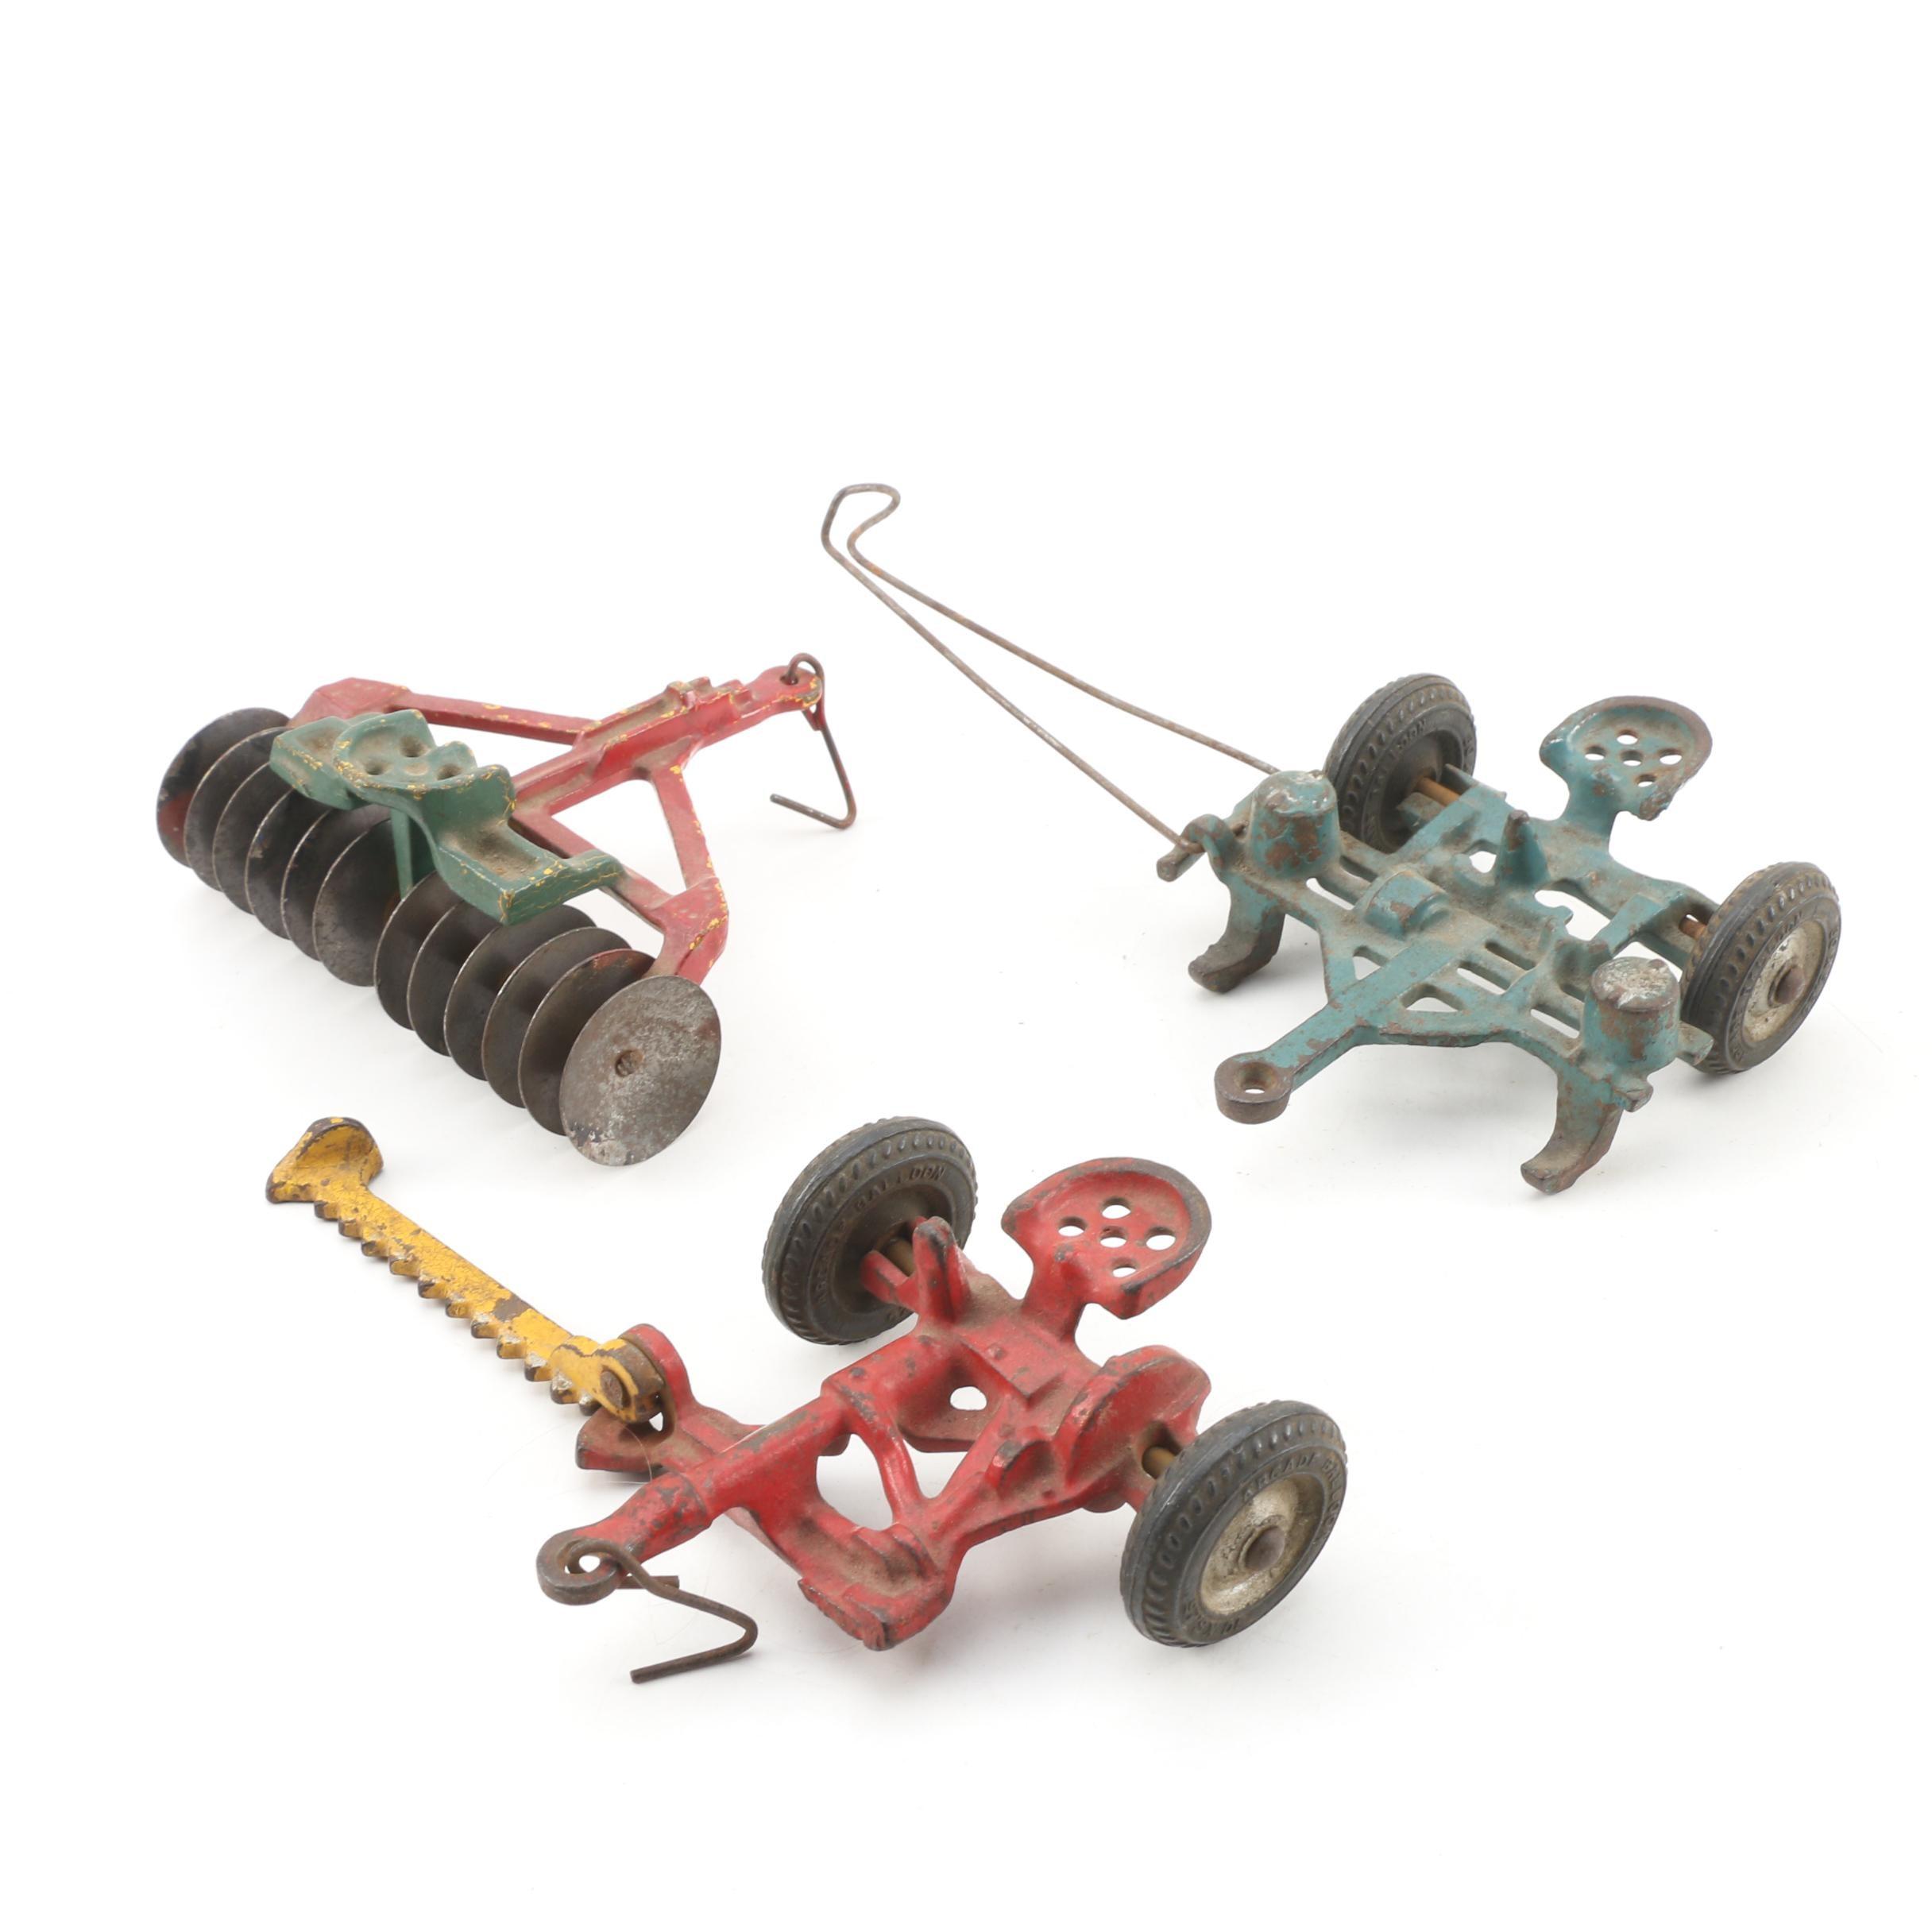 Cast Metal Toy Farm Machinery by Arcade